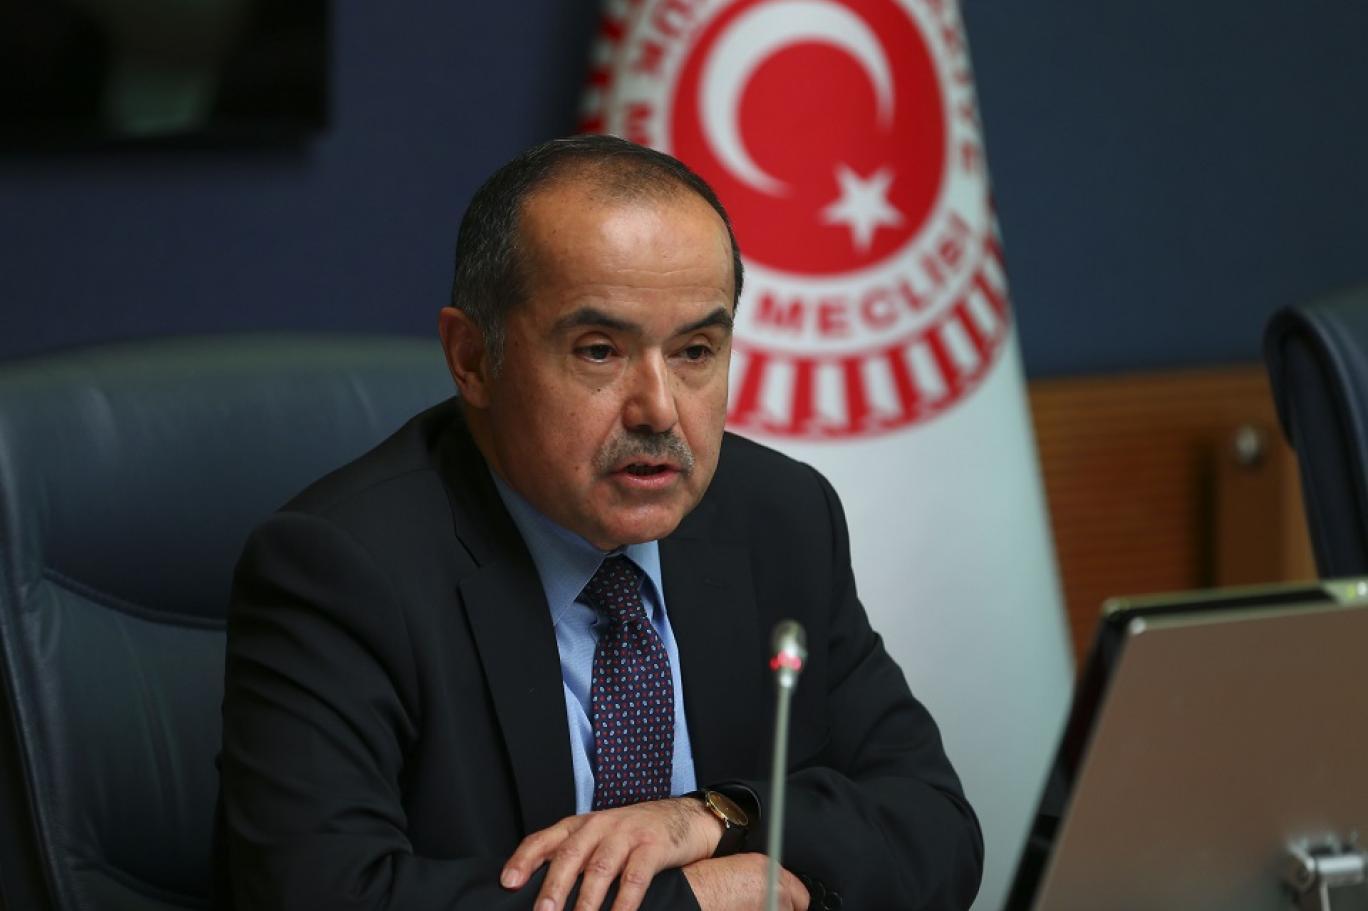 AKP'li vekil Aydoğdu: Şeriat bizim hukukumuzdur